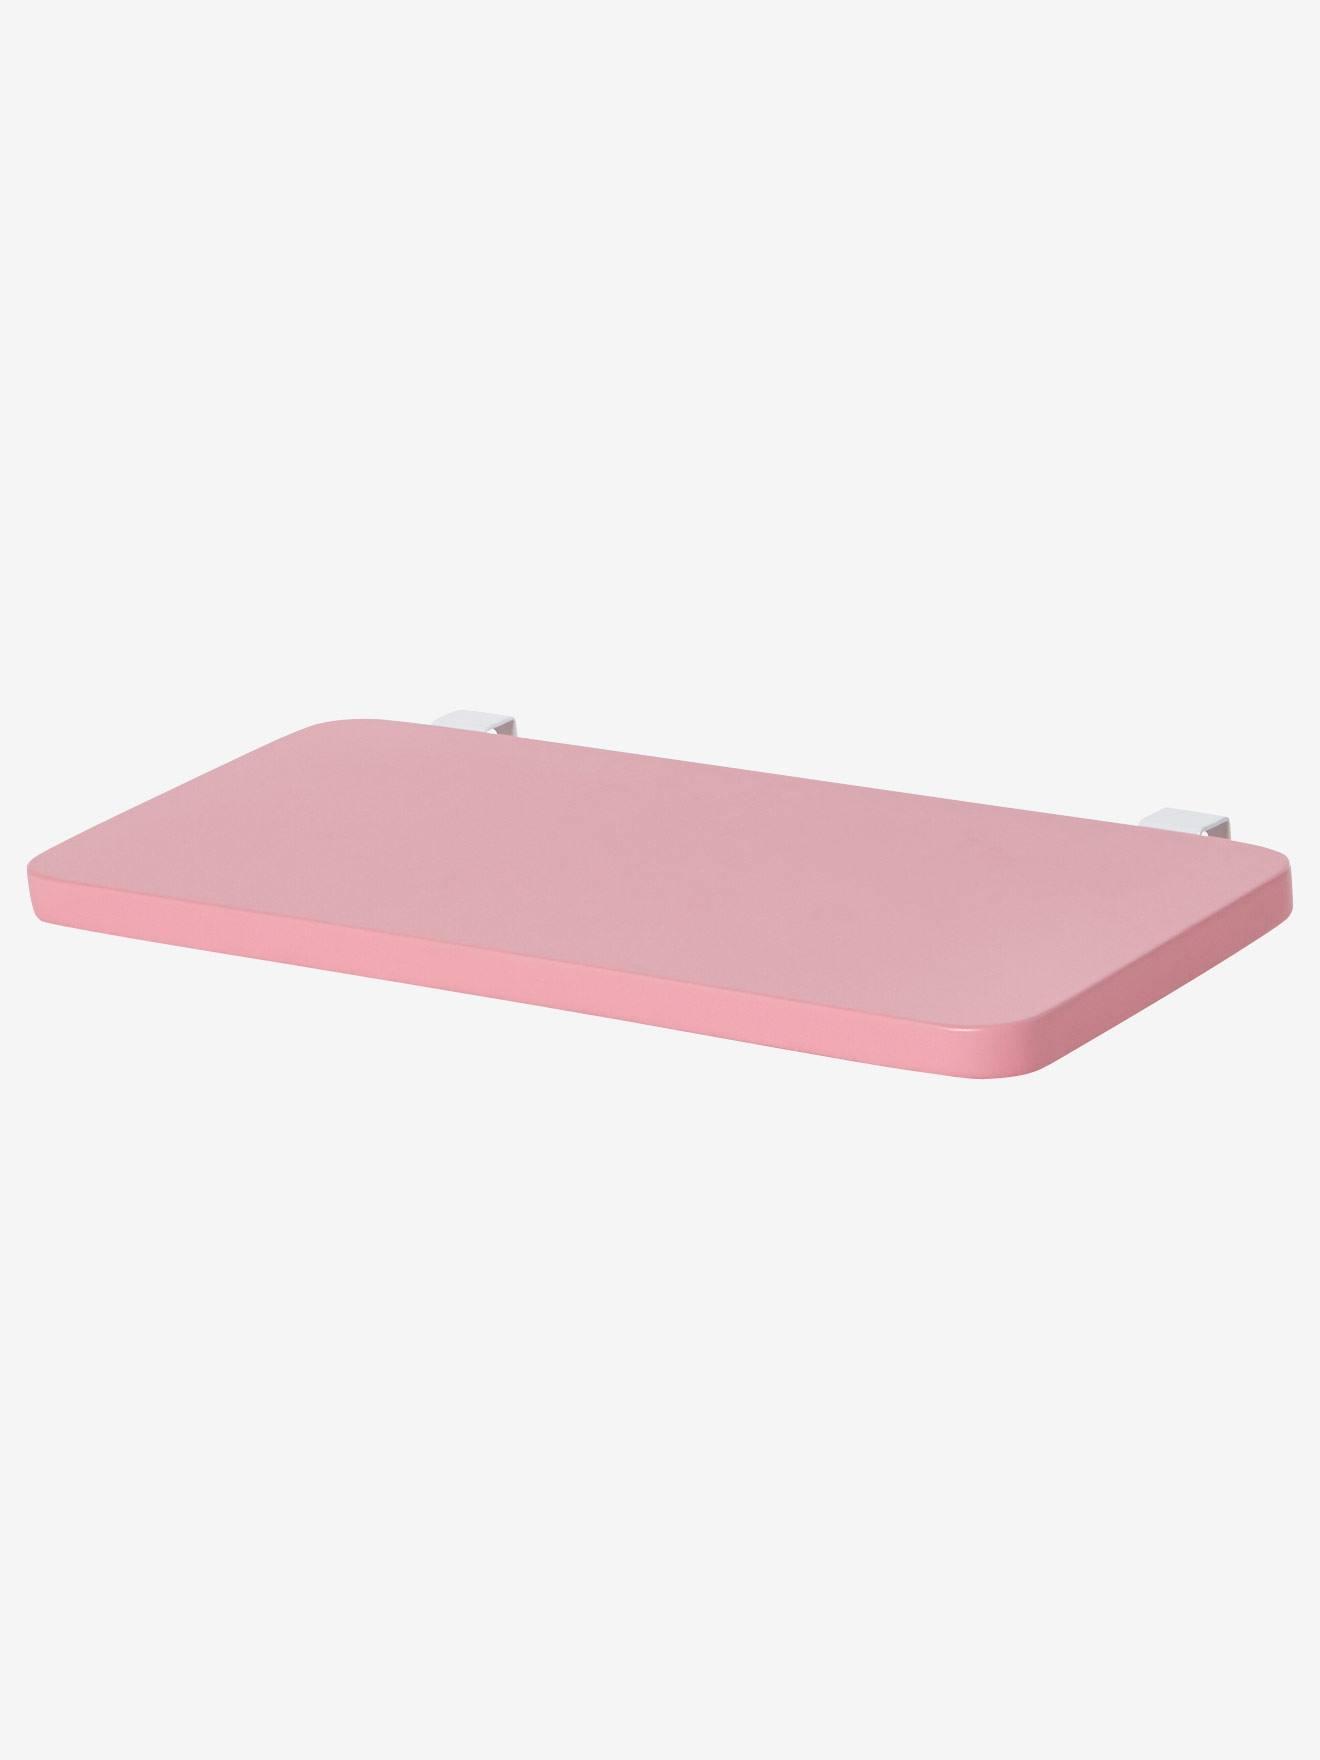 amazing tablette chevet suspendre pour ligne everest. Black Bedroom Furniture Sets. Home Design Ideas